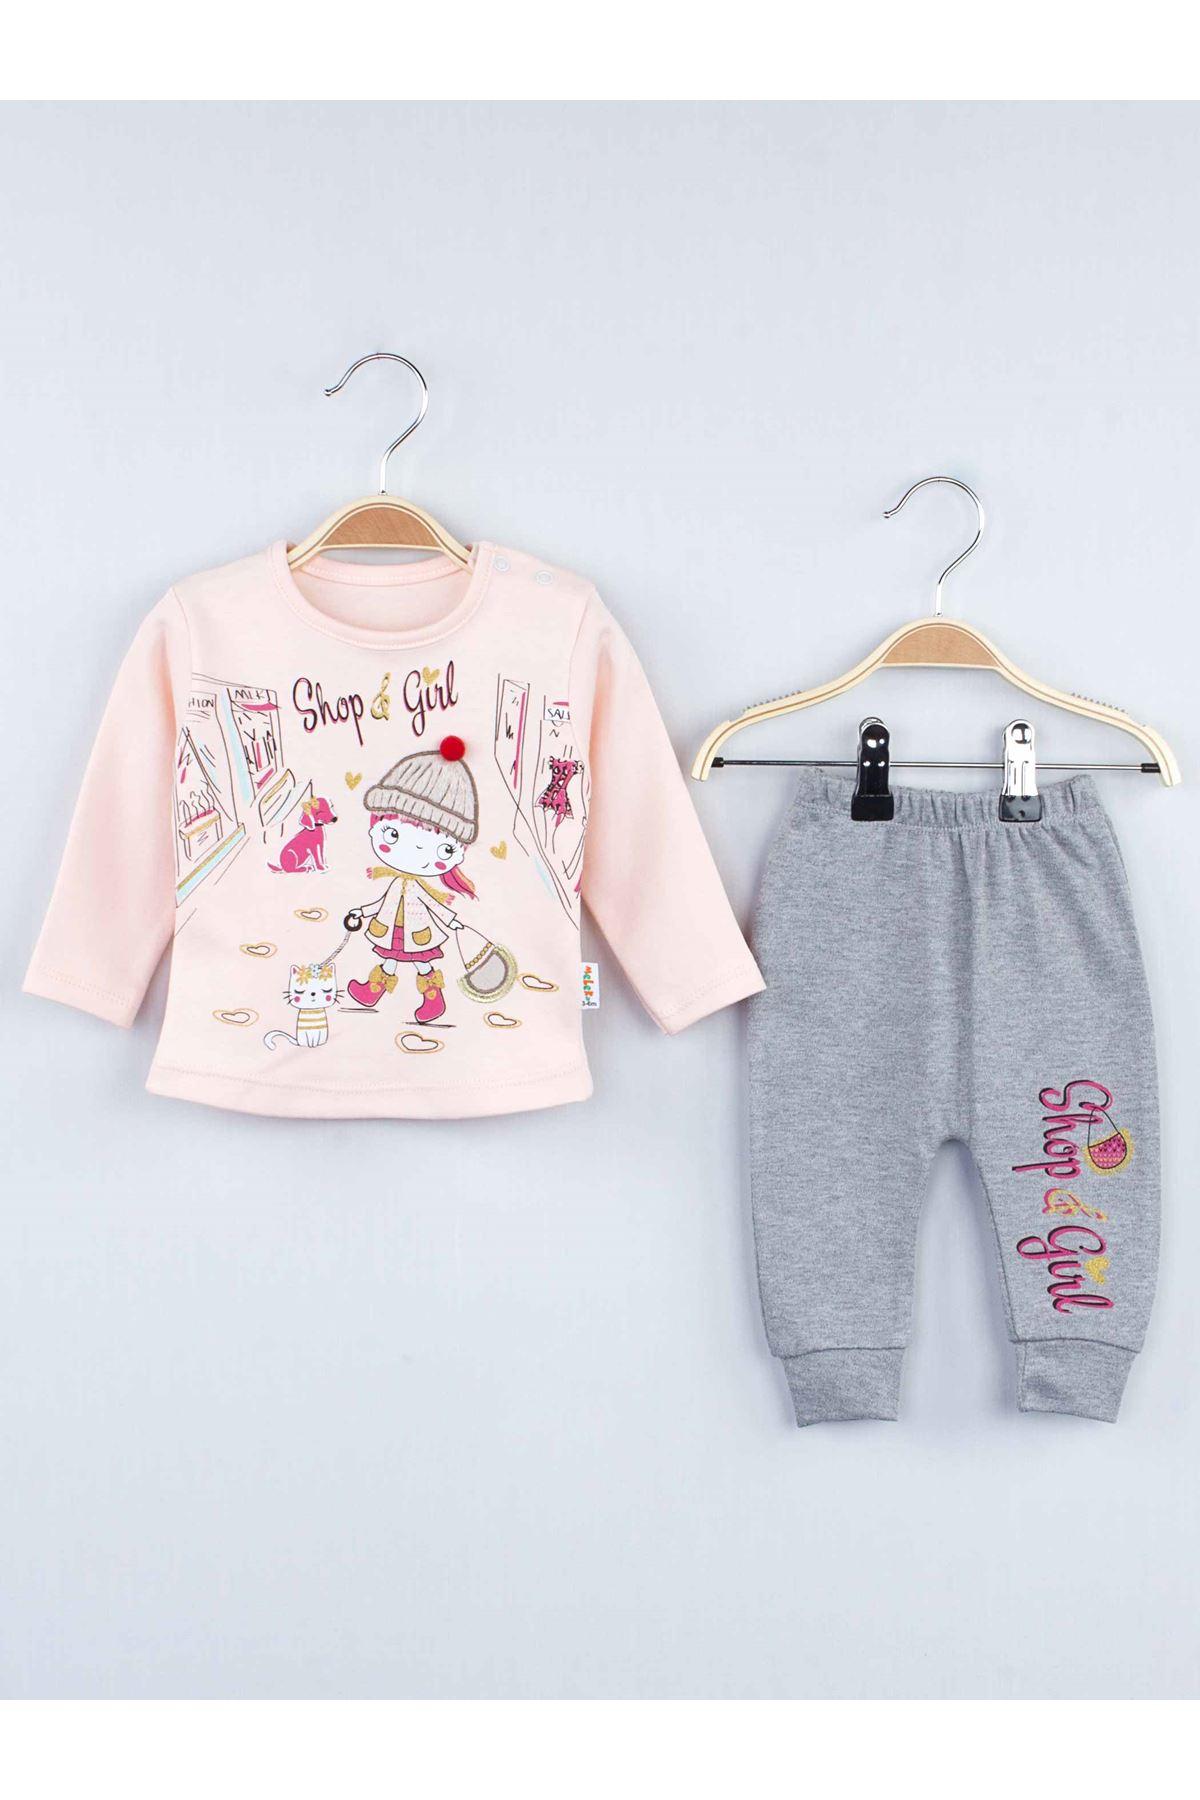 Powder Seasonal Girl Baby 2 Piece Suit